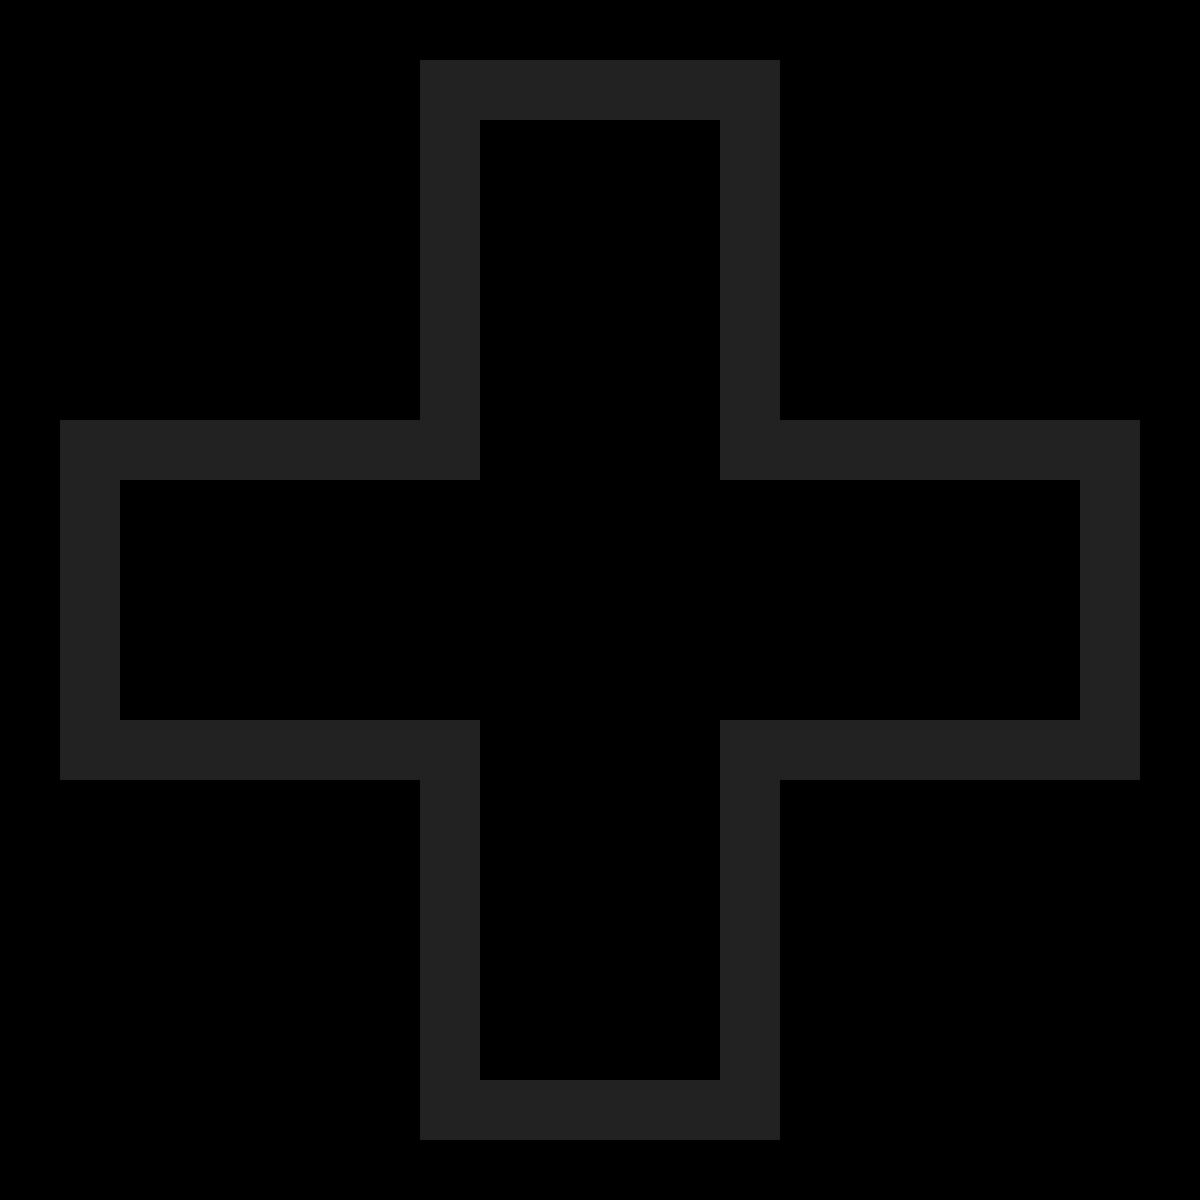 shape  geometry  line  form  graphic  figure  cross icon icon